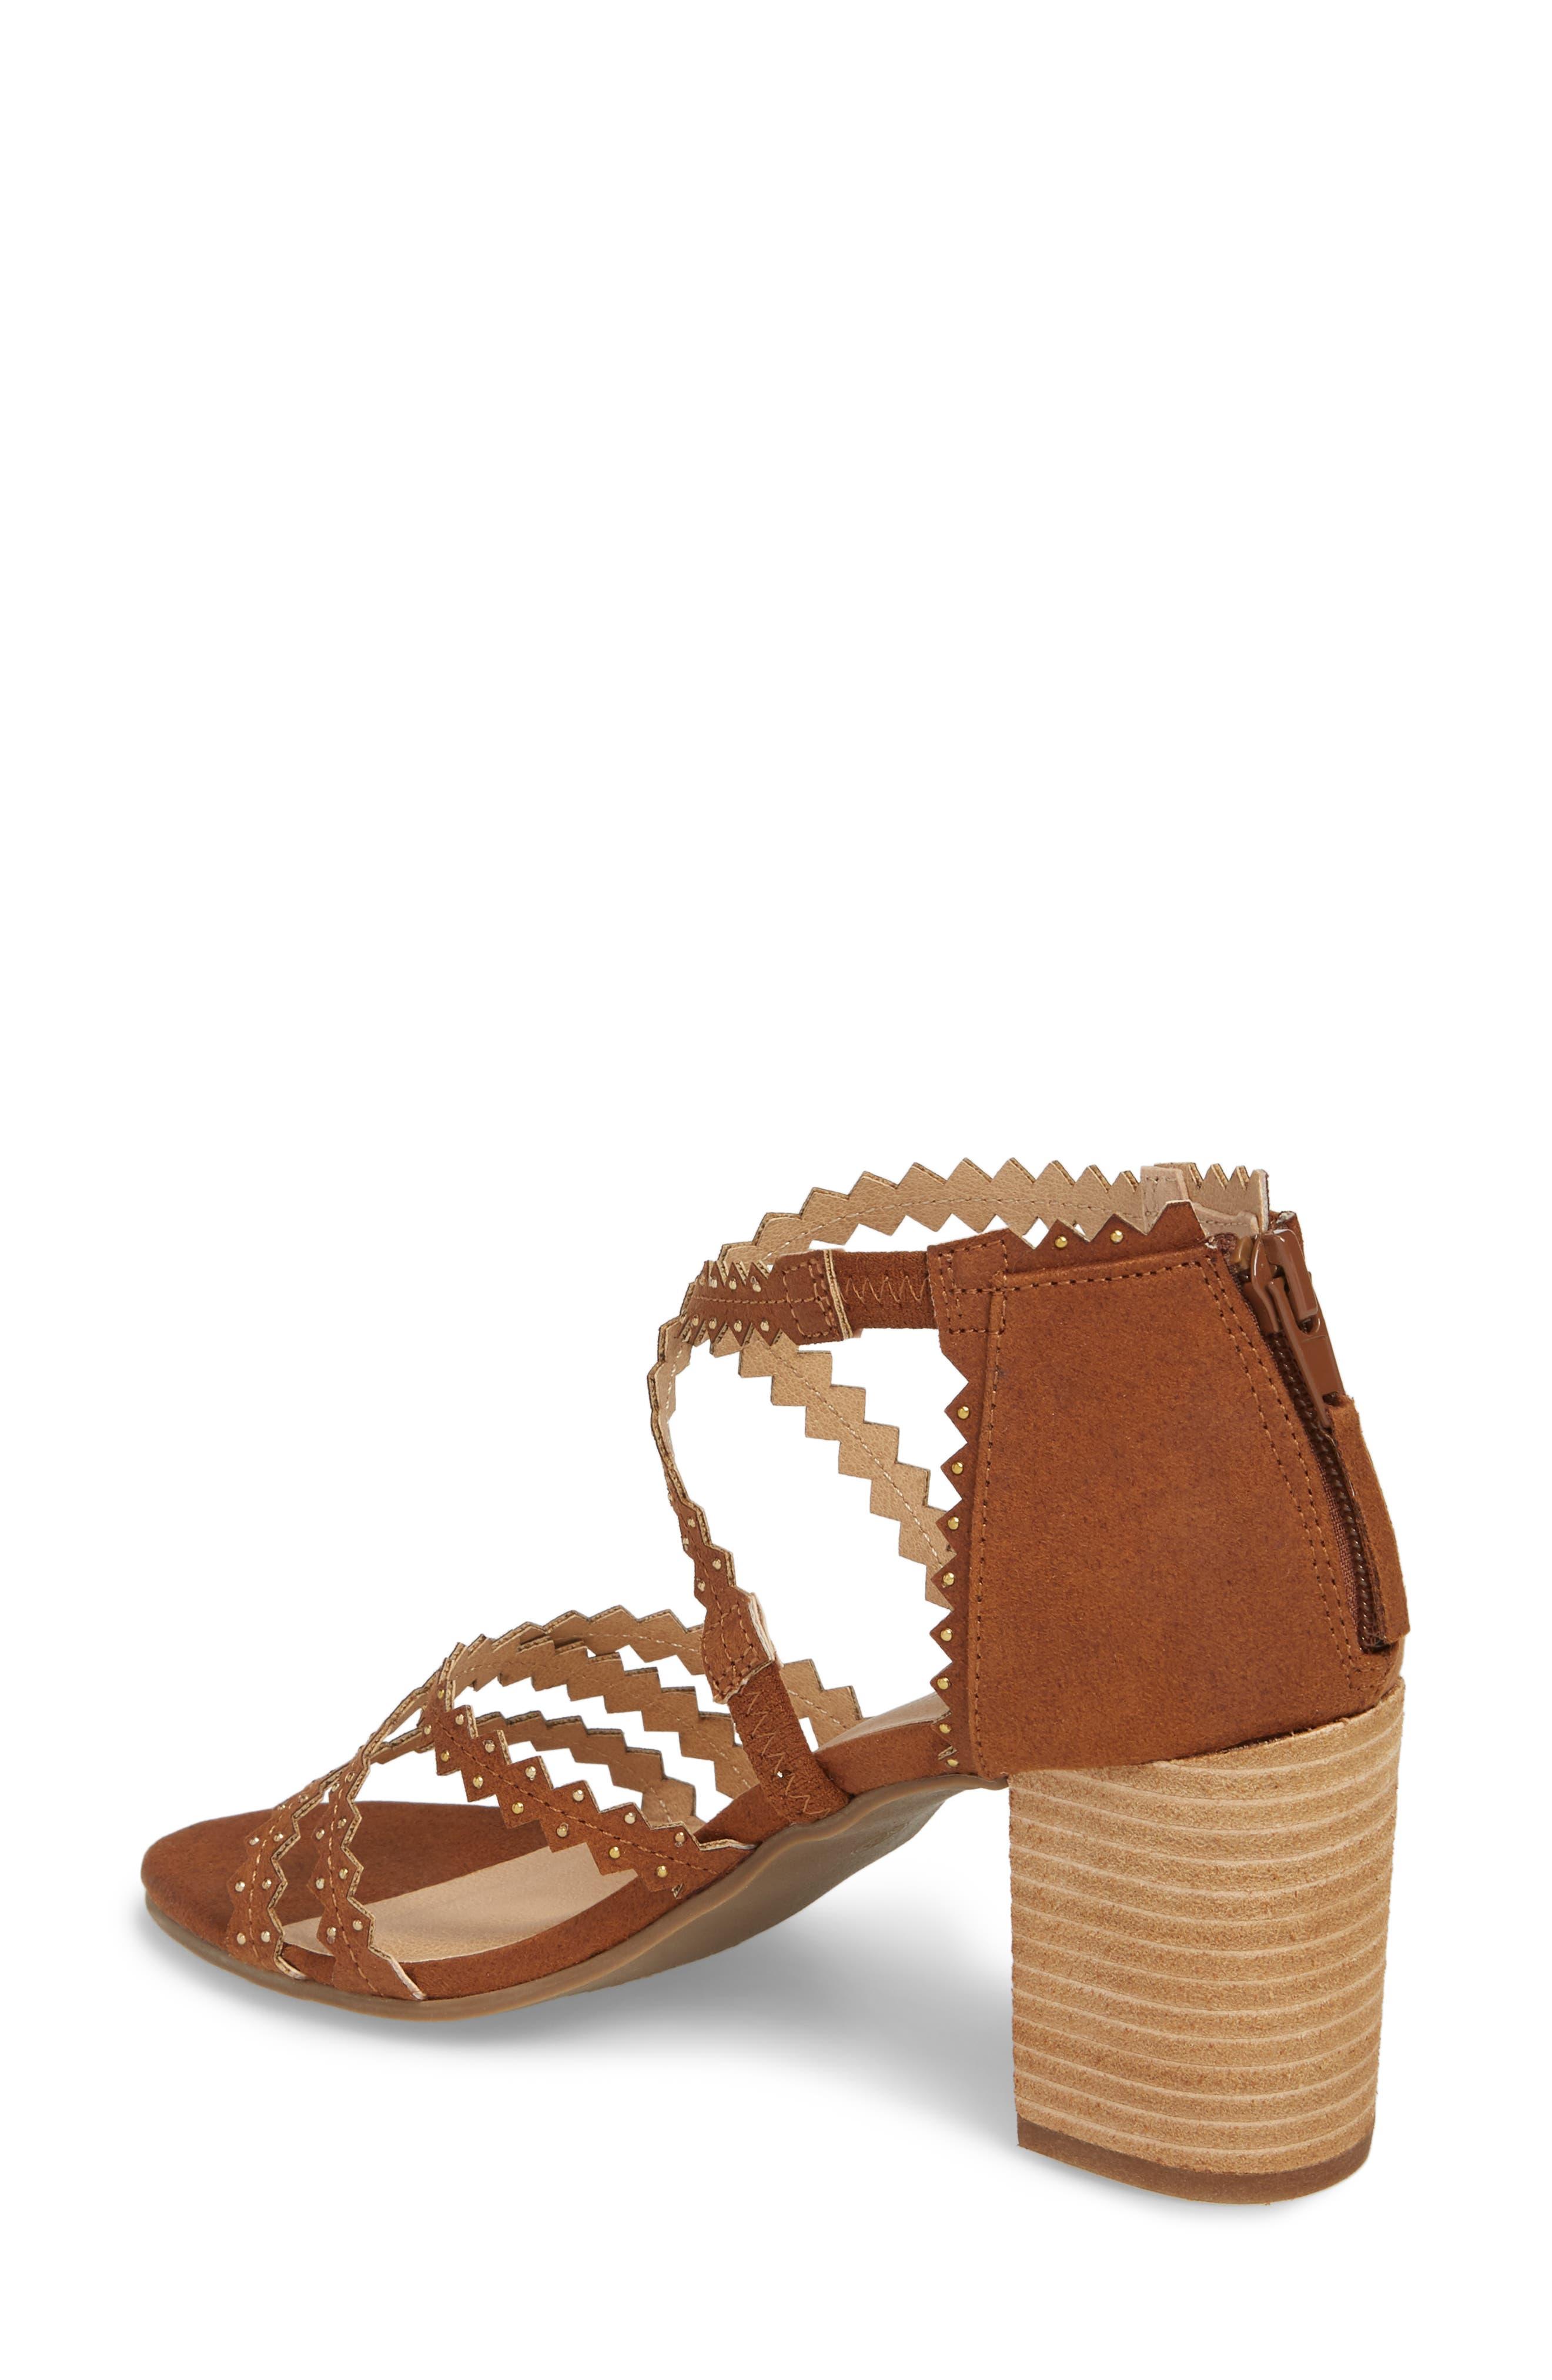 Aiden Block Heel Sandal,                             Alternate thumbnail 2, color,                             SADDLE SUEDE